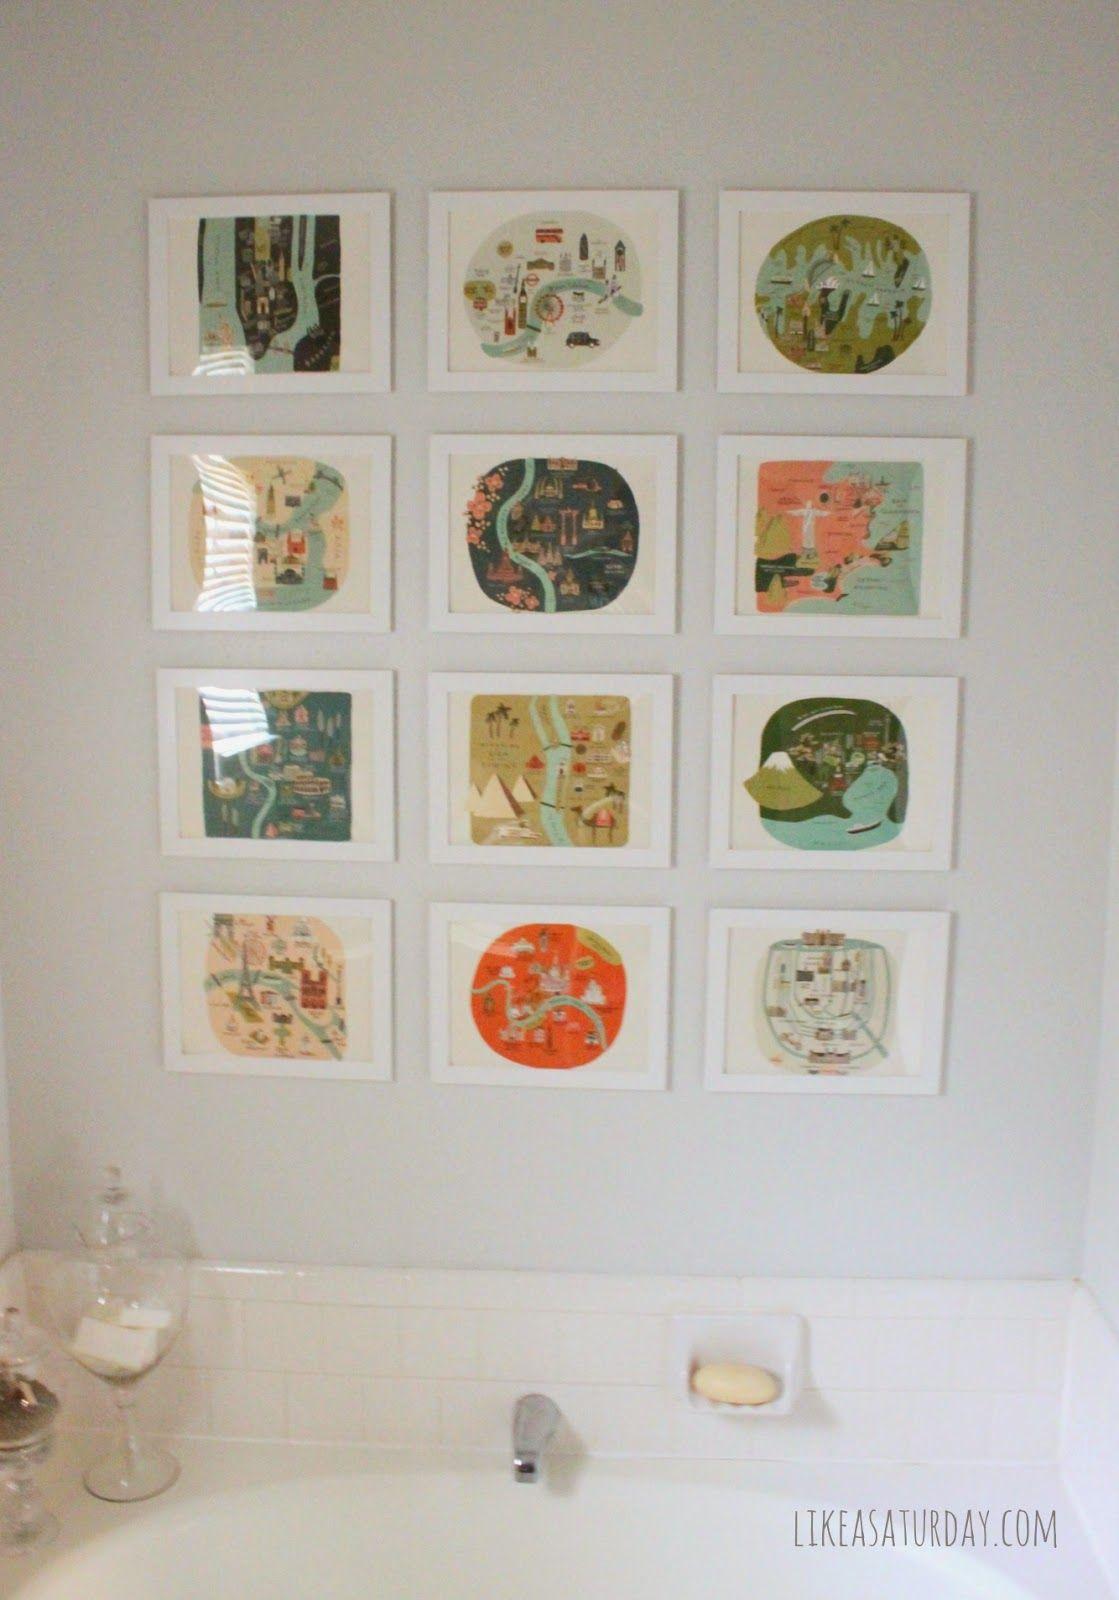 Decorate Your Bathroom Walls With Trendy Artwork Bathroom Wall Art Gallery Wall Decor